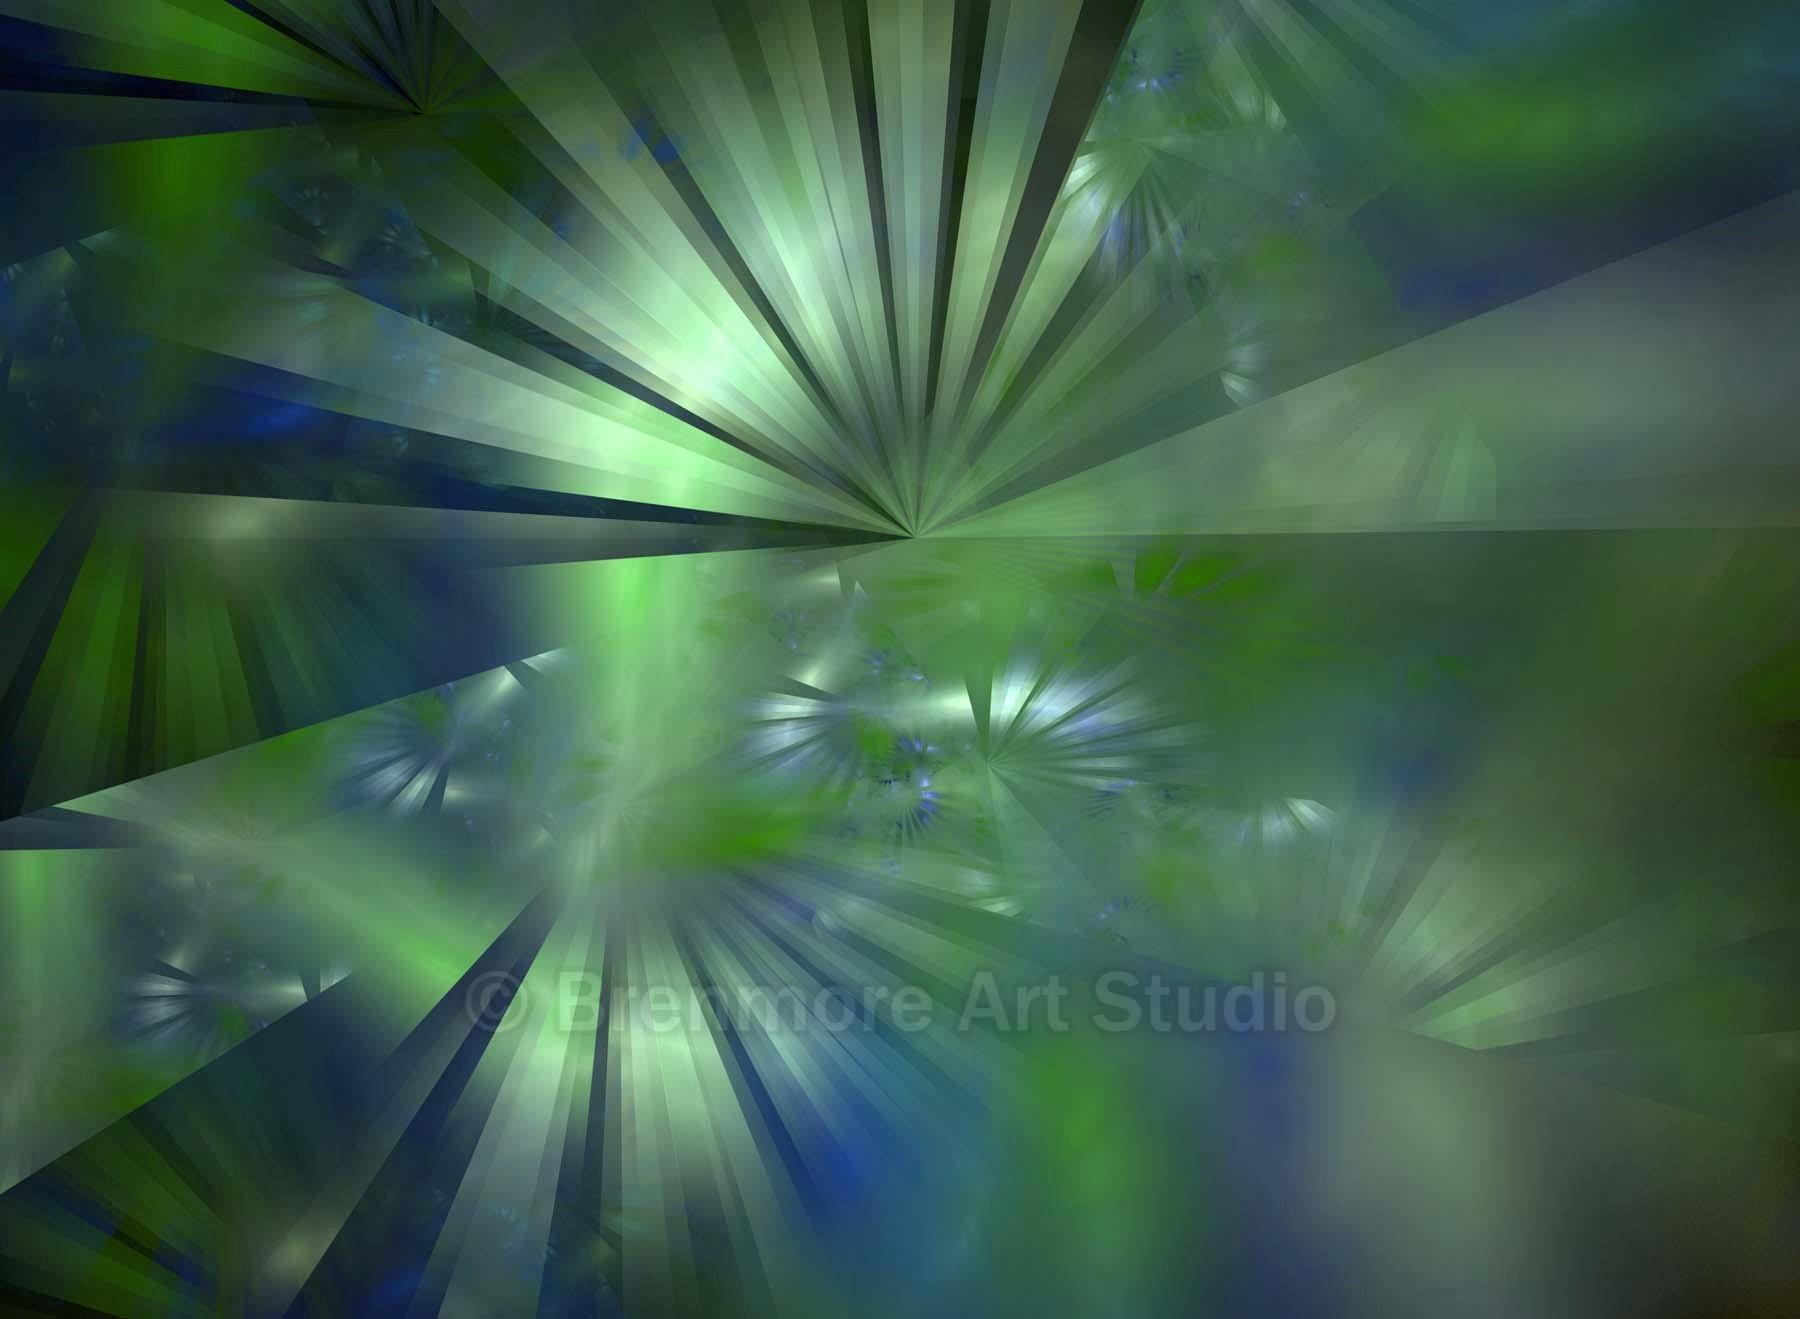 Green Reflective Light Rays on Blue